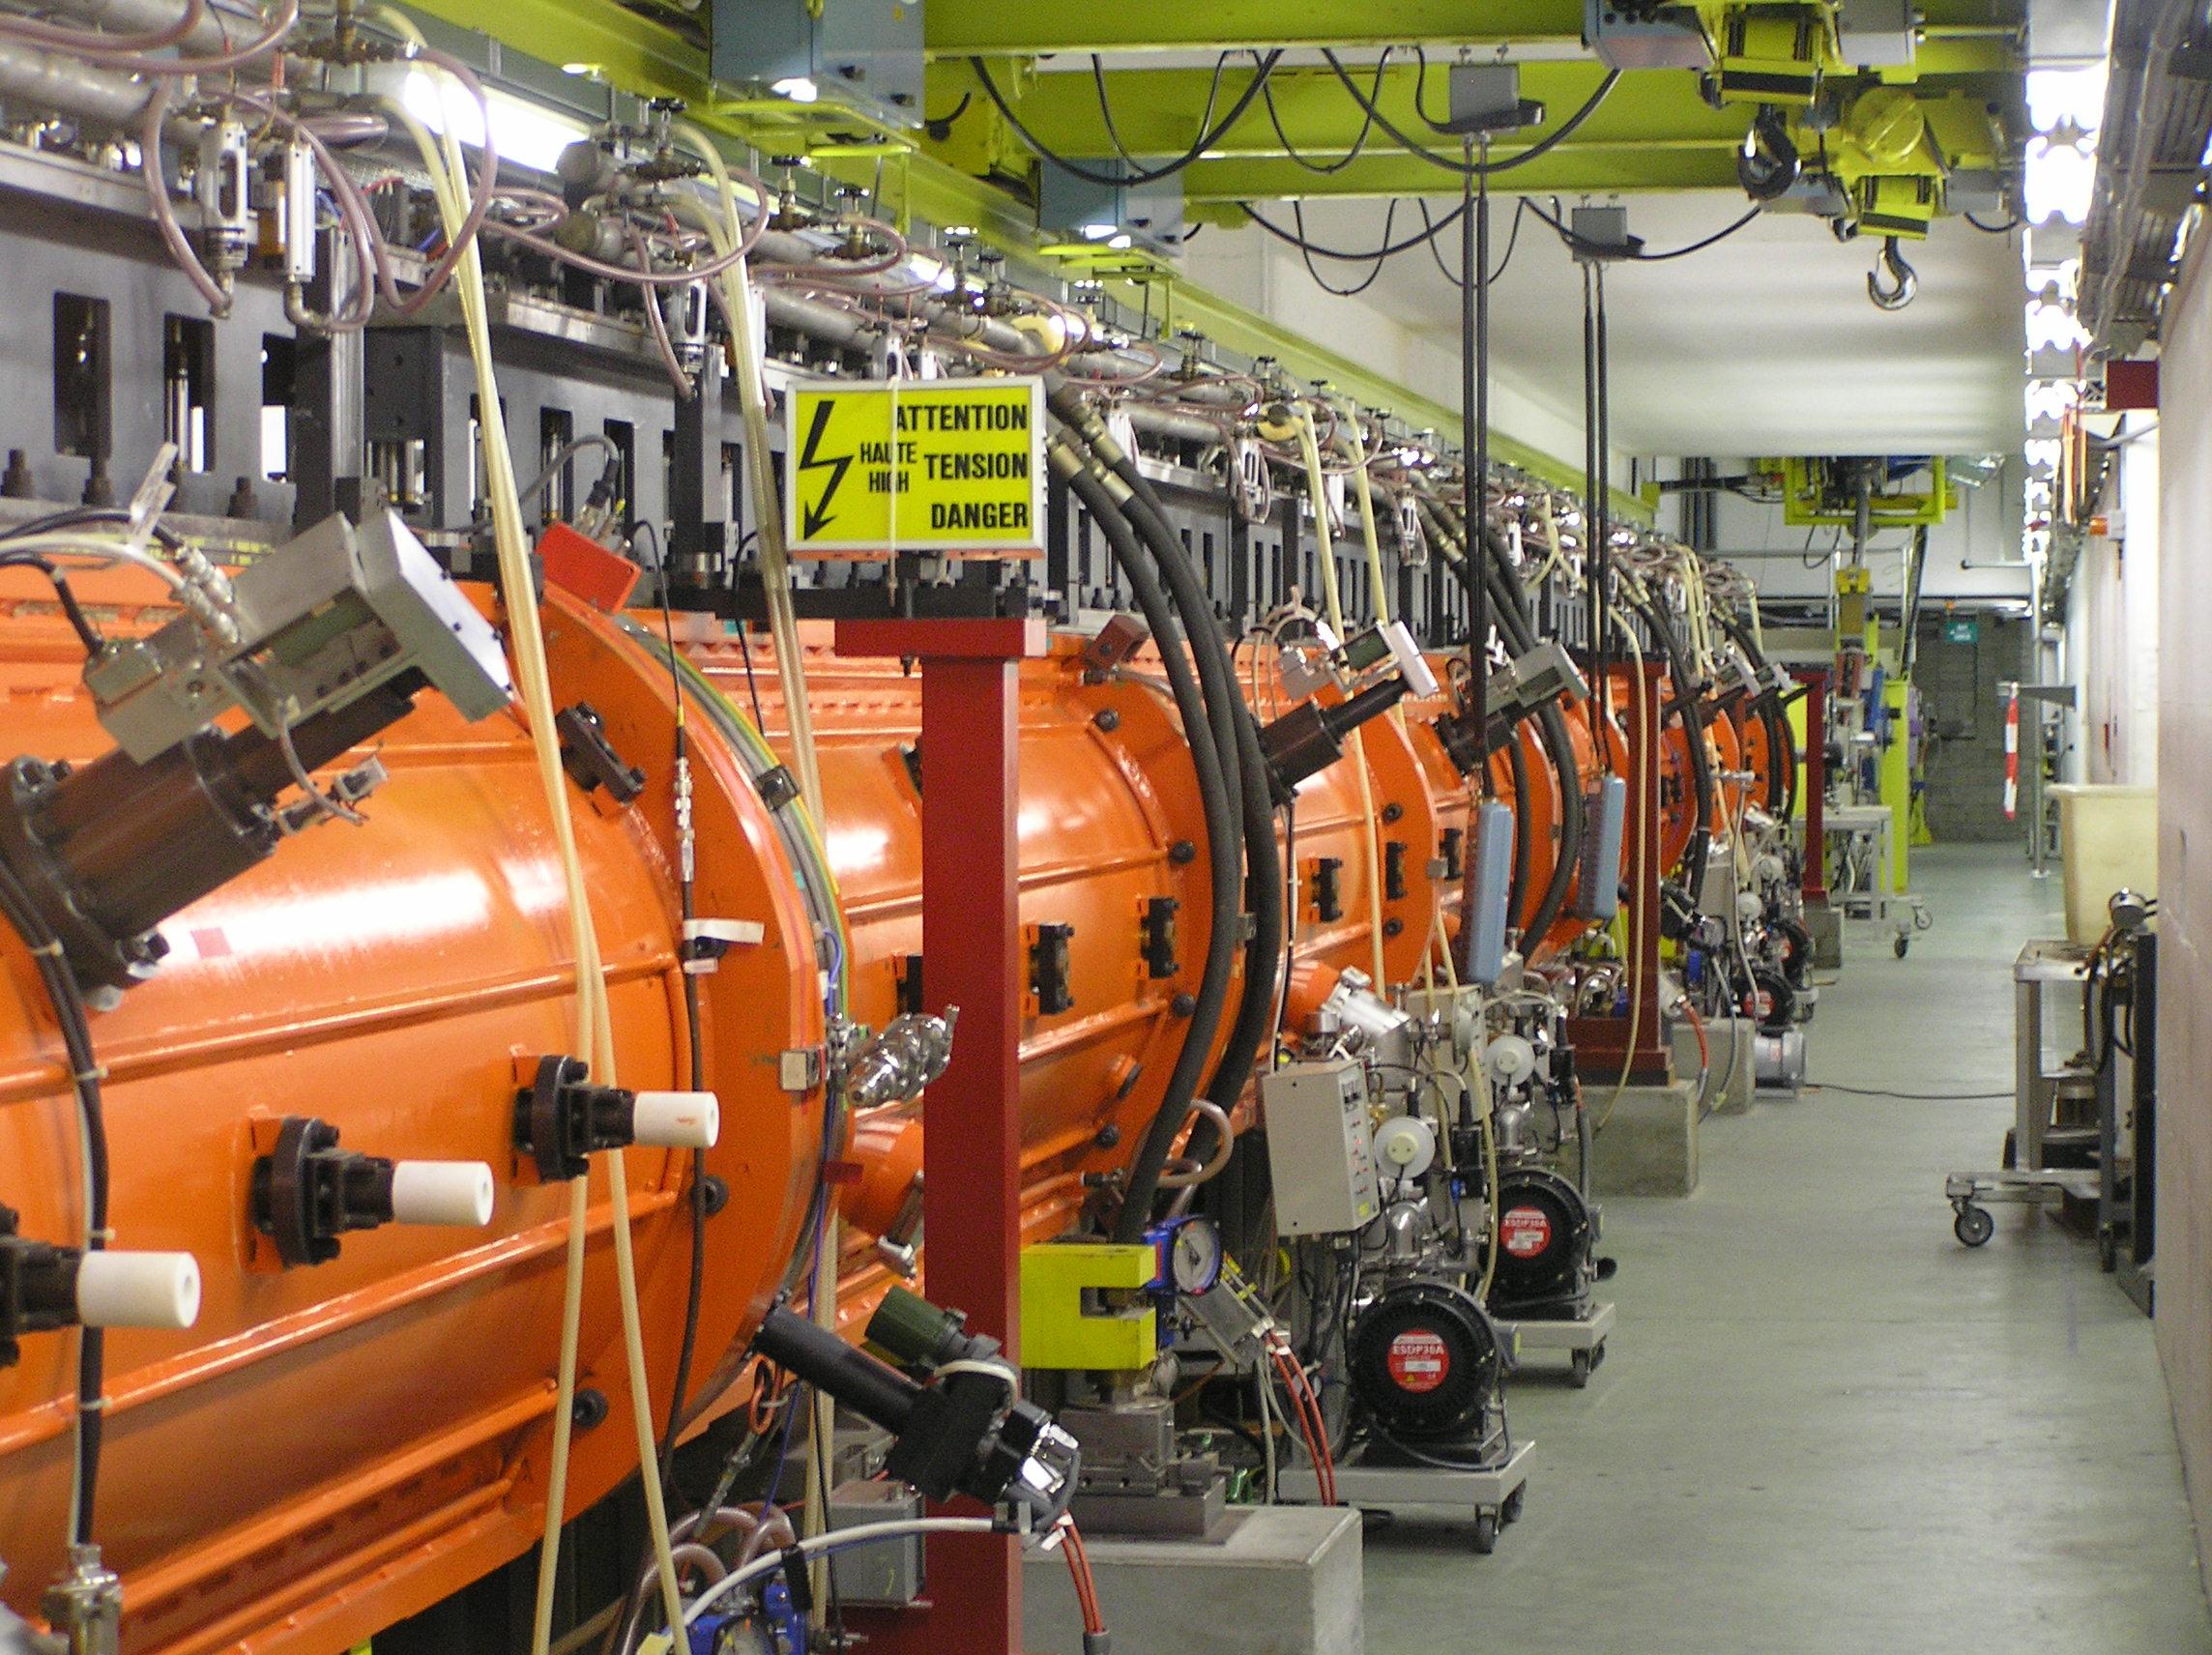 An experimental linear collider.